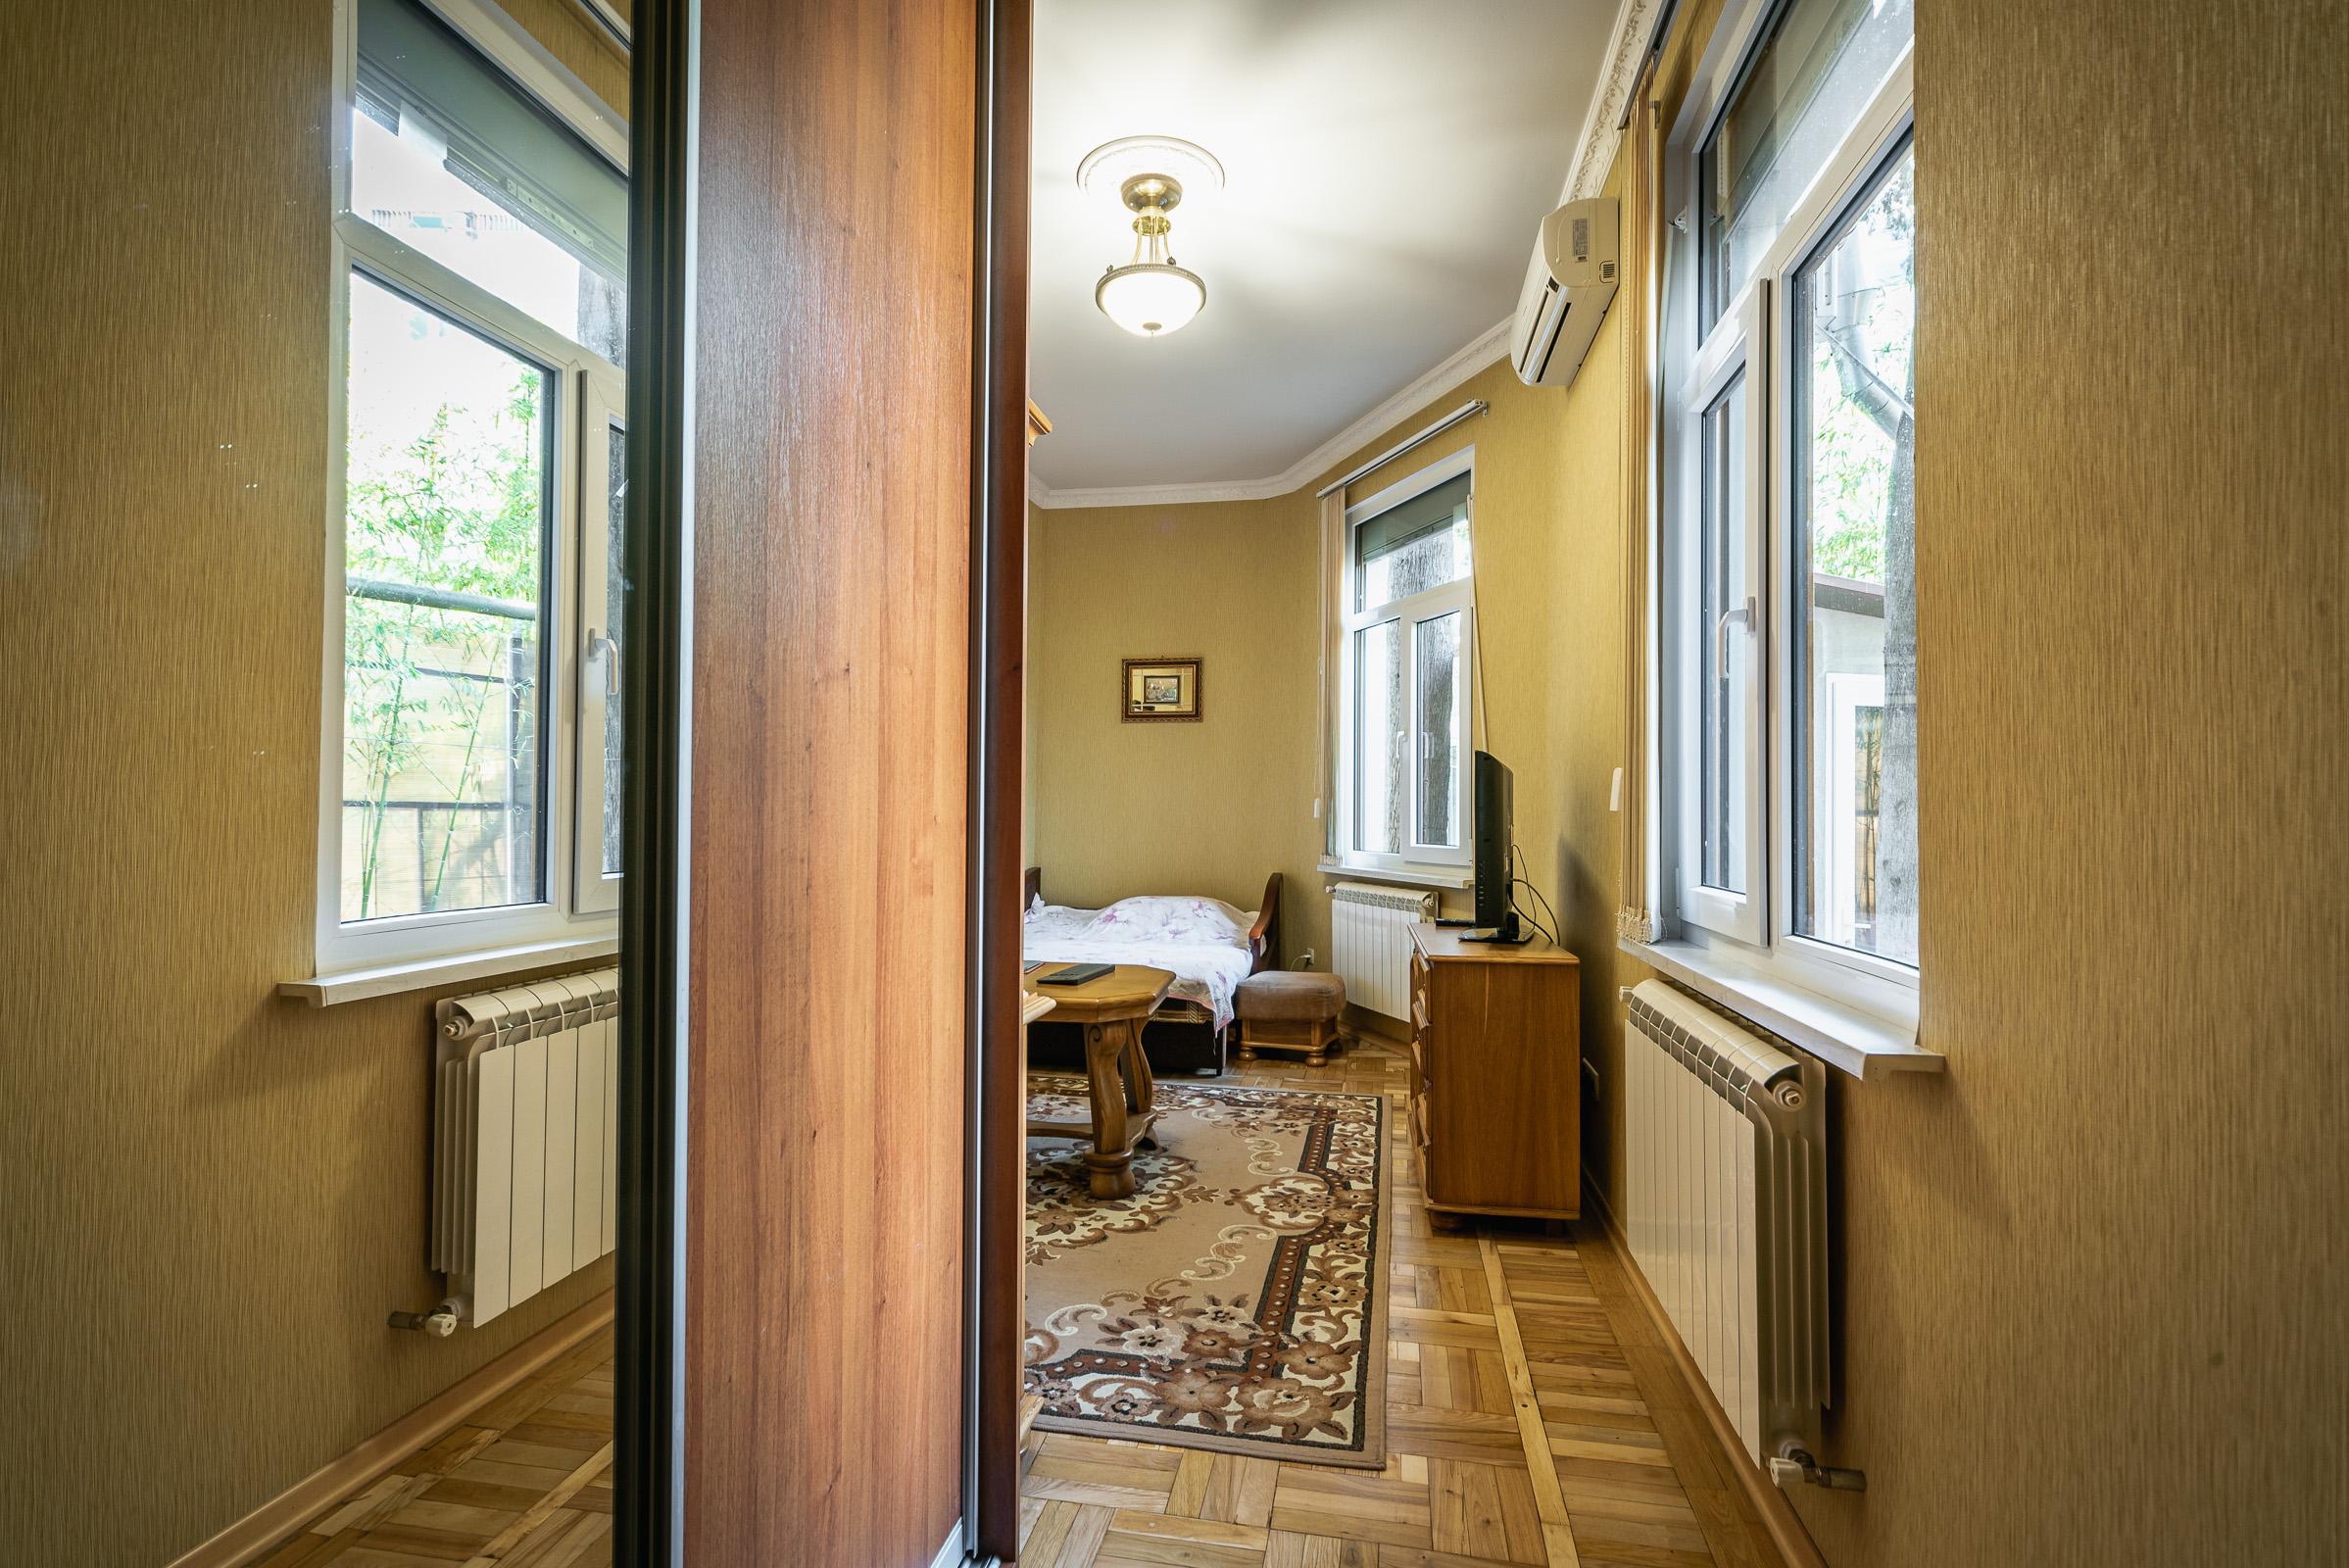 Квартира в историческом доме 13